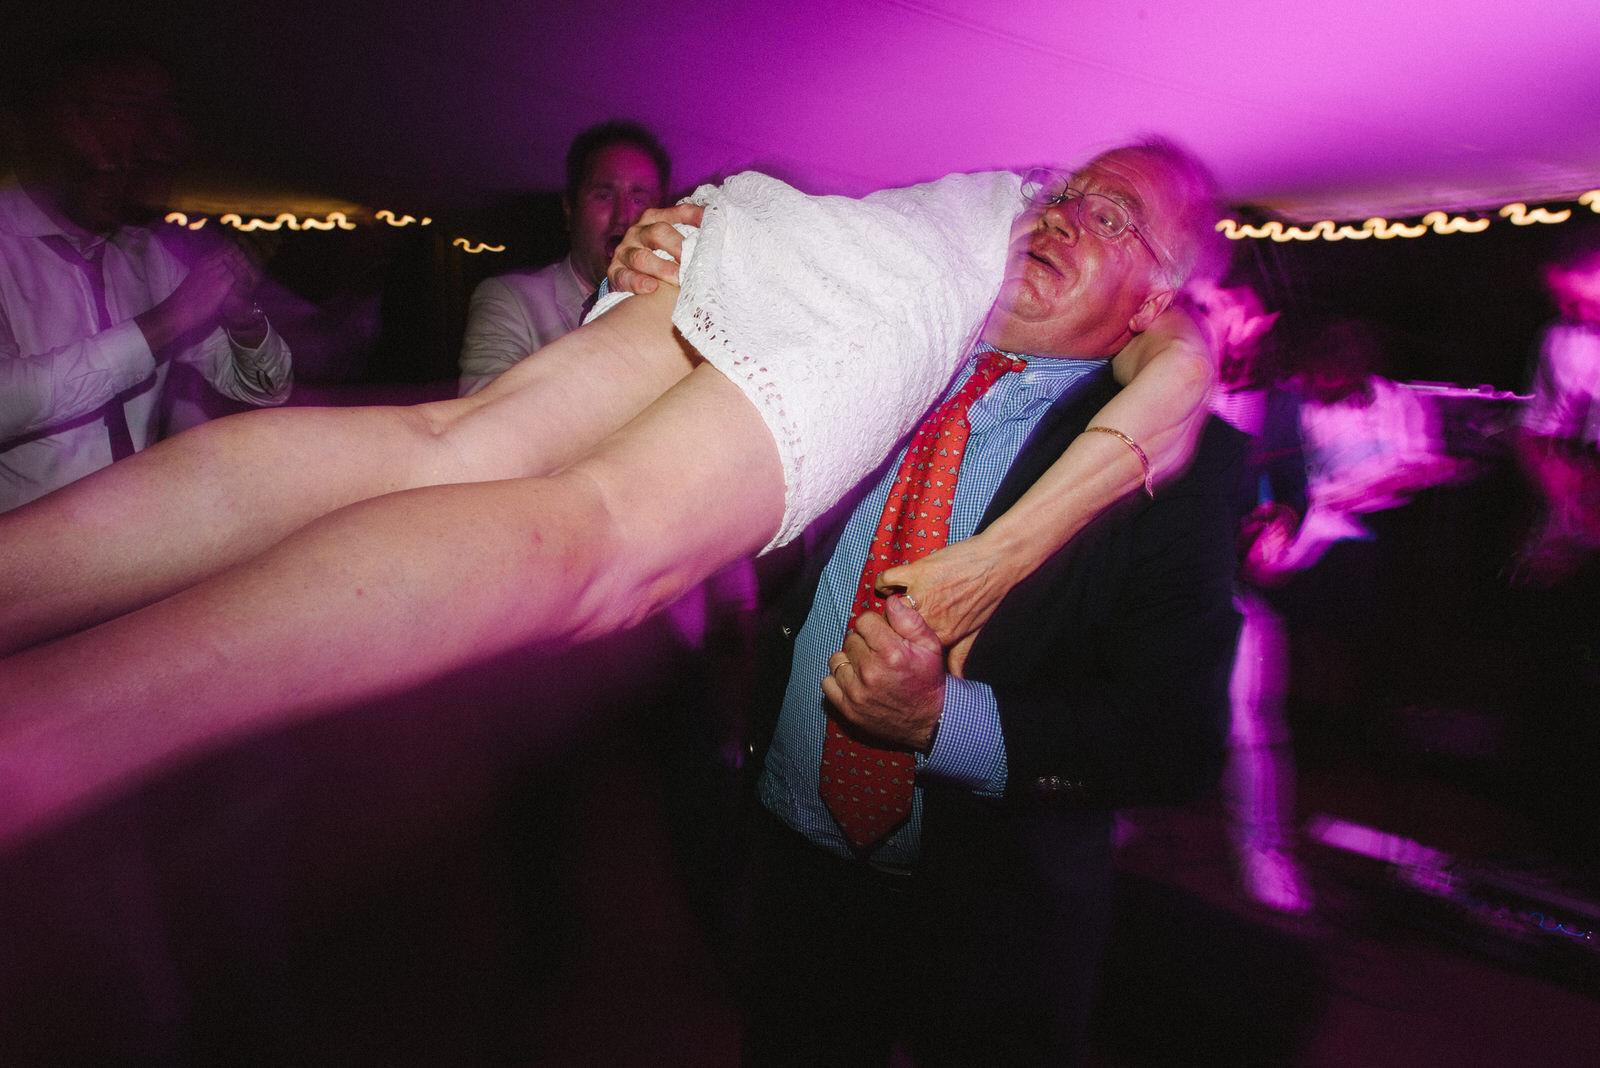 044-LOURMARIN-WEDDING-PHOTOGRAPHER-PROVENCE-WEDDING-ALTERNATIVE-WEDDING-PHOTOGRAPHY-FRANCE-PROVENCE-GARDEN-WEDDING.JPG